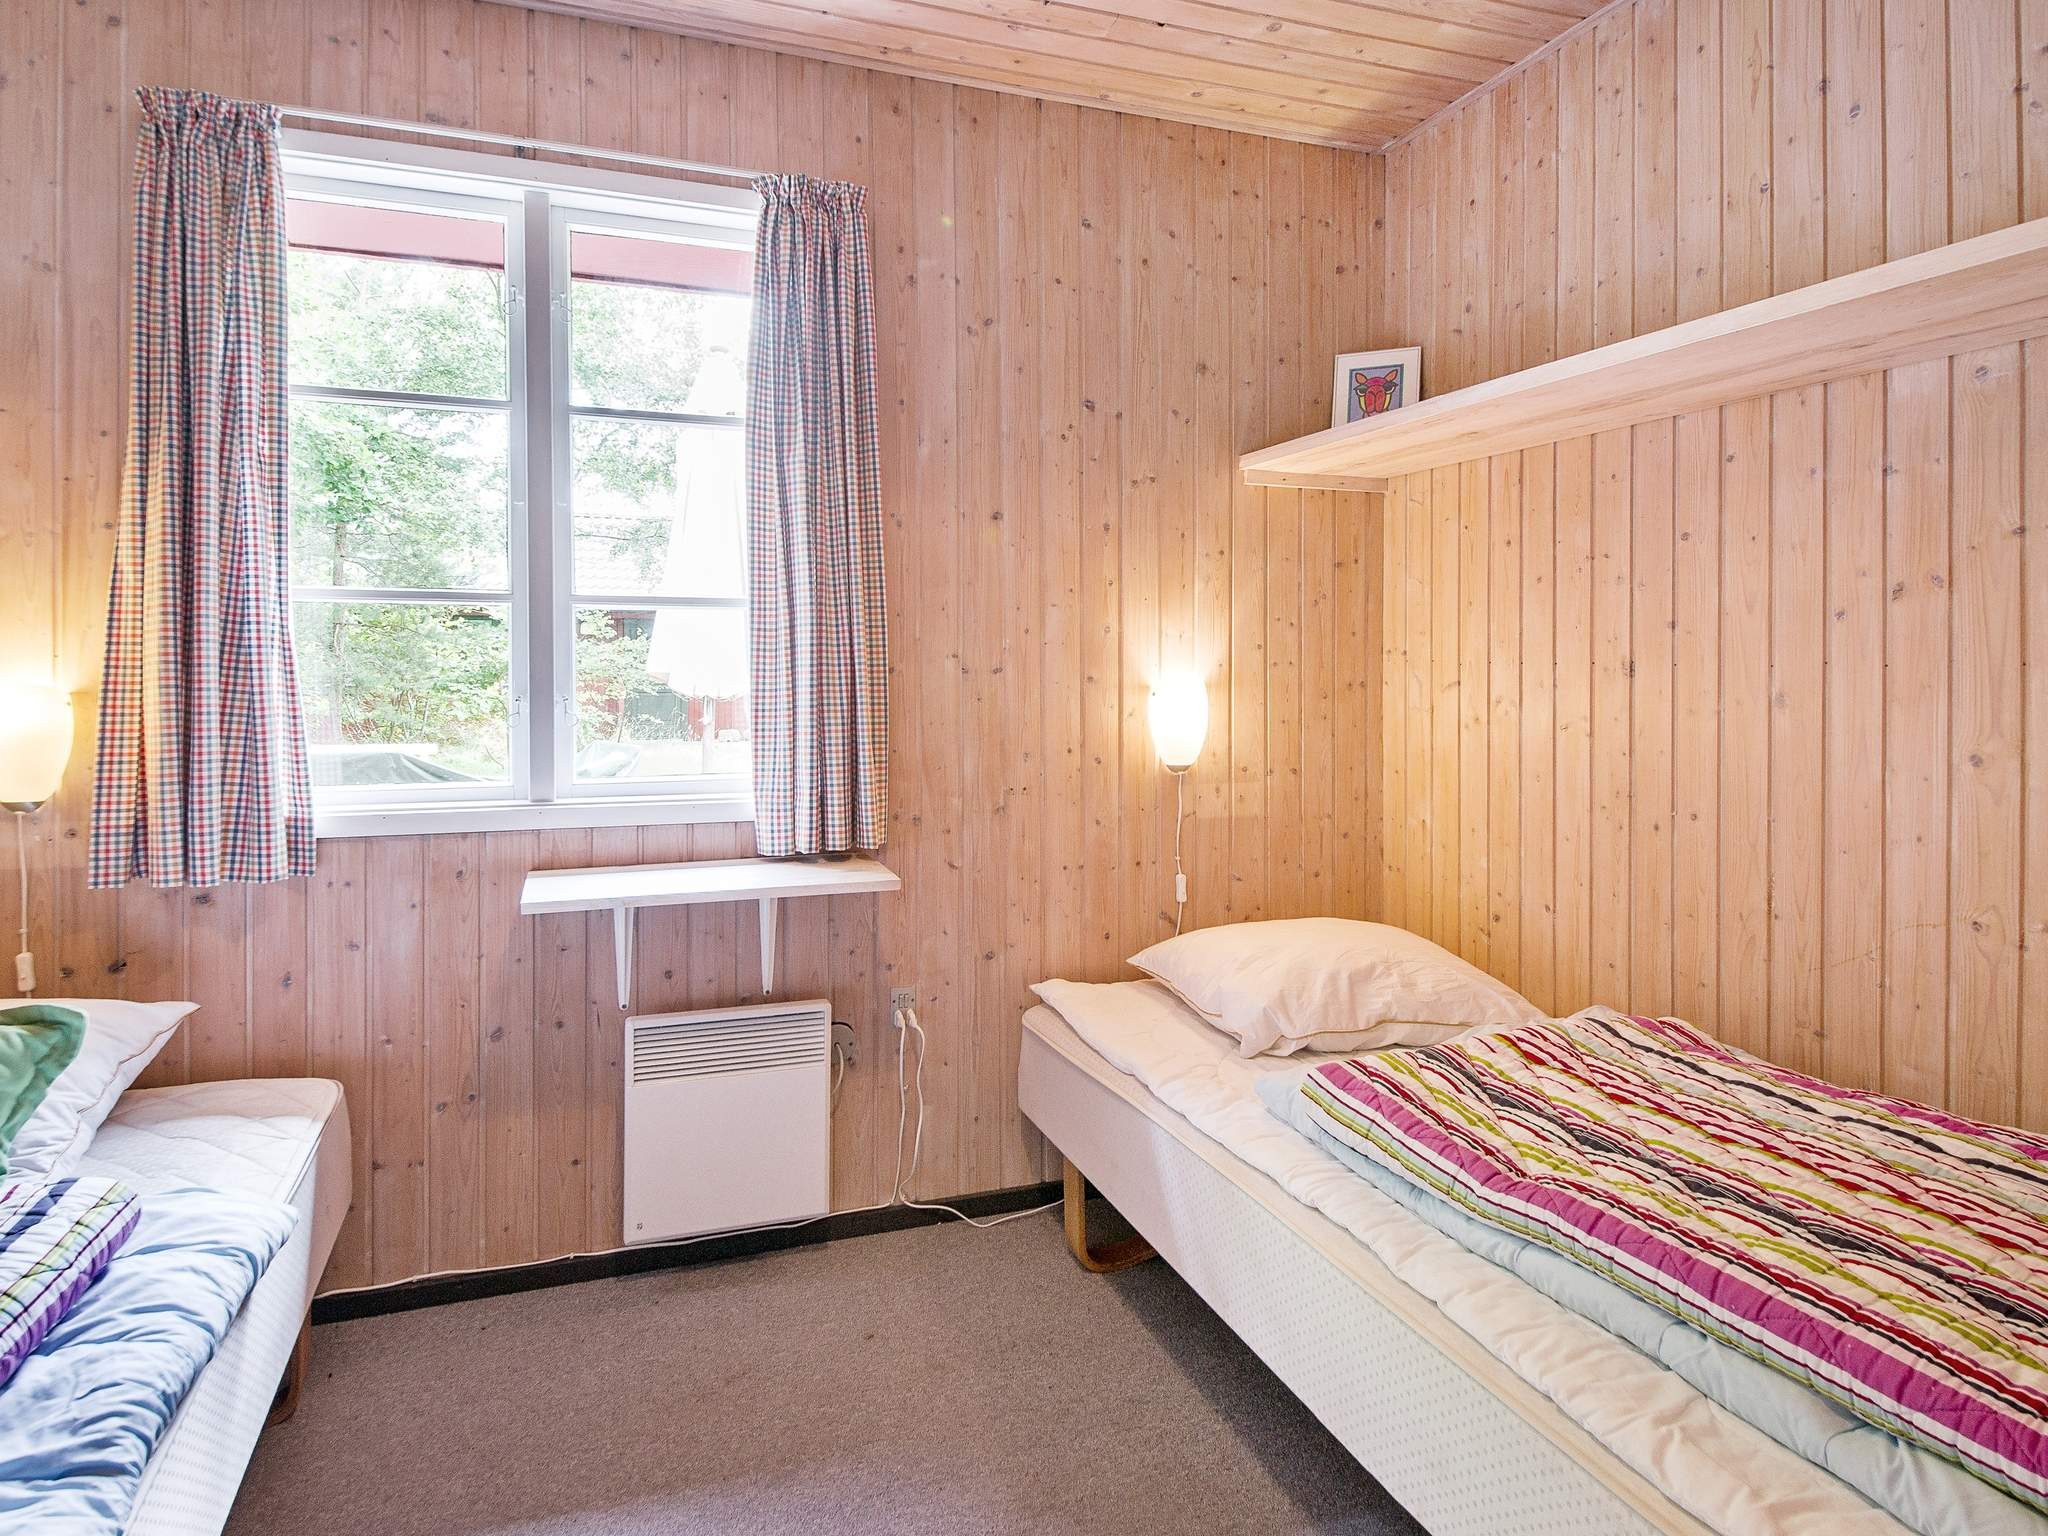 Ferienhaus Dueodde (241744), Nexø, , Bornholm, Dänemark, Bild 7